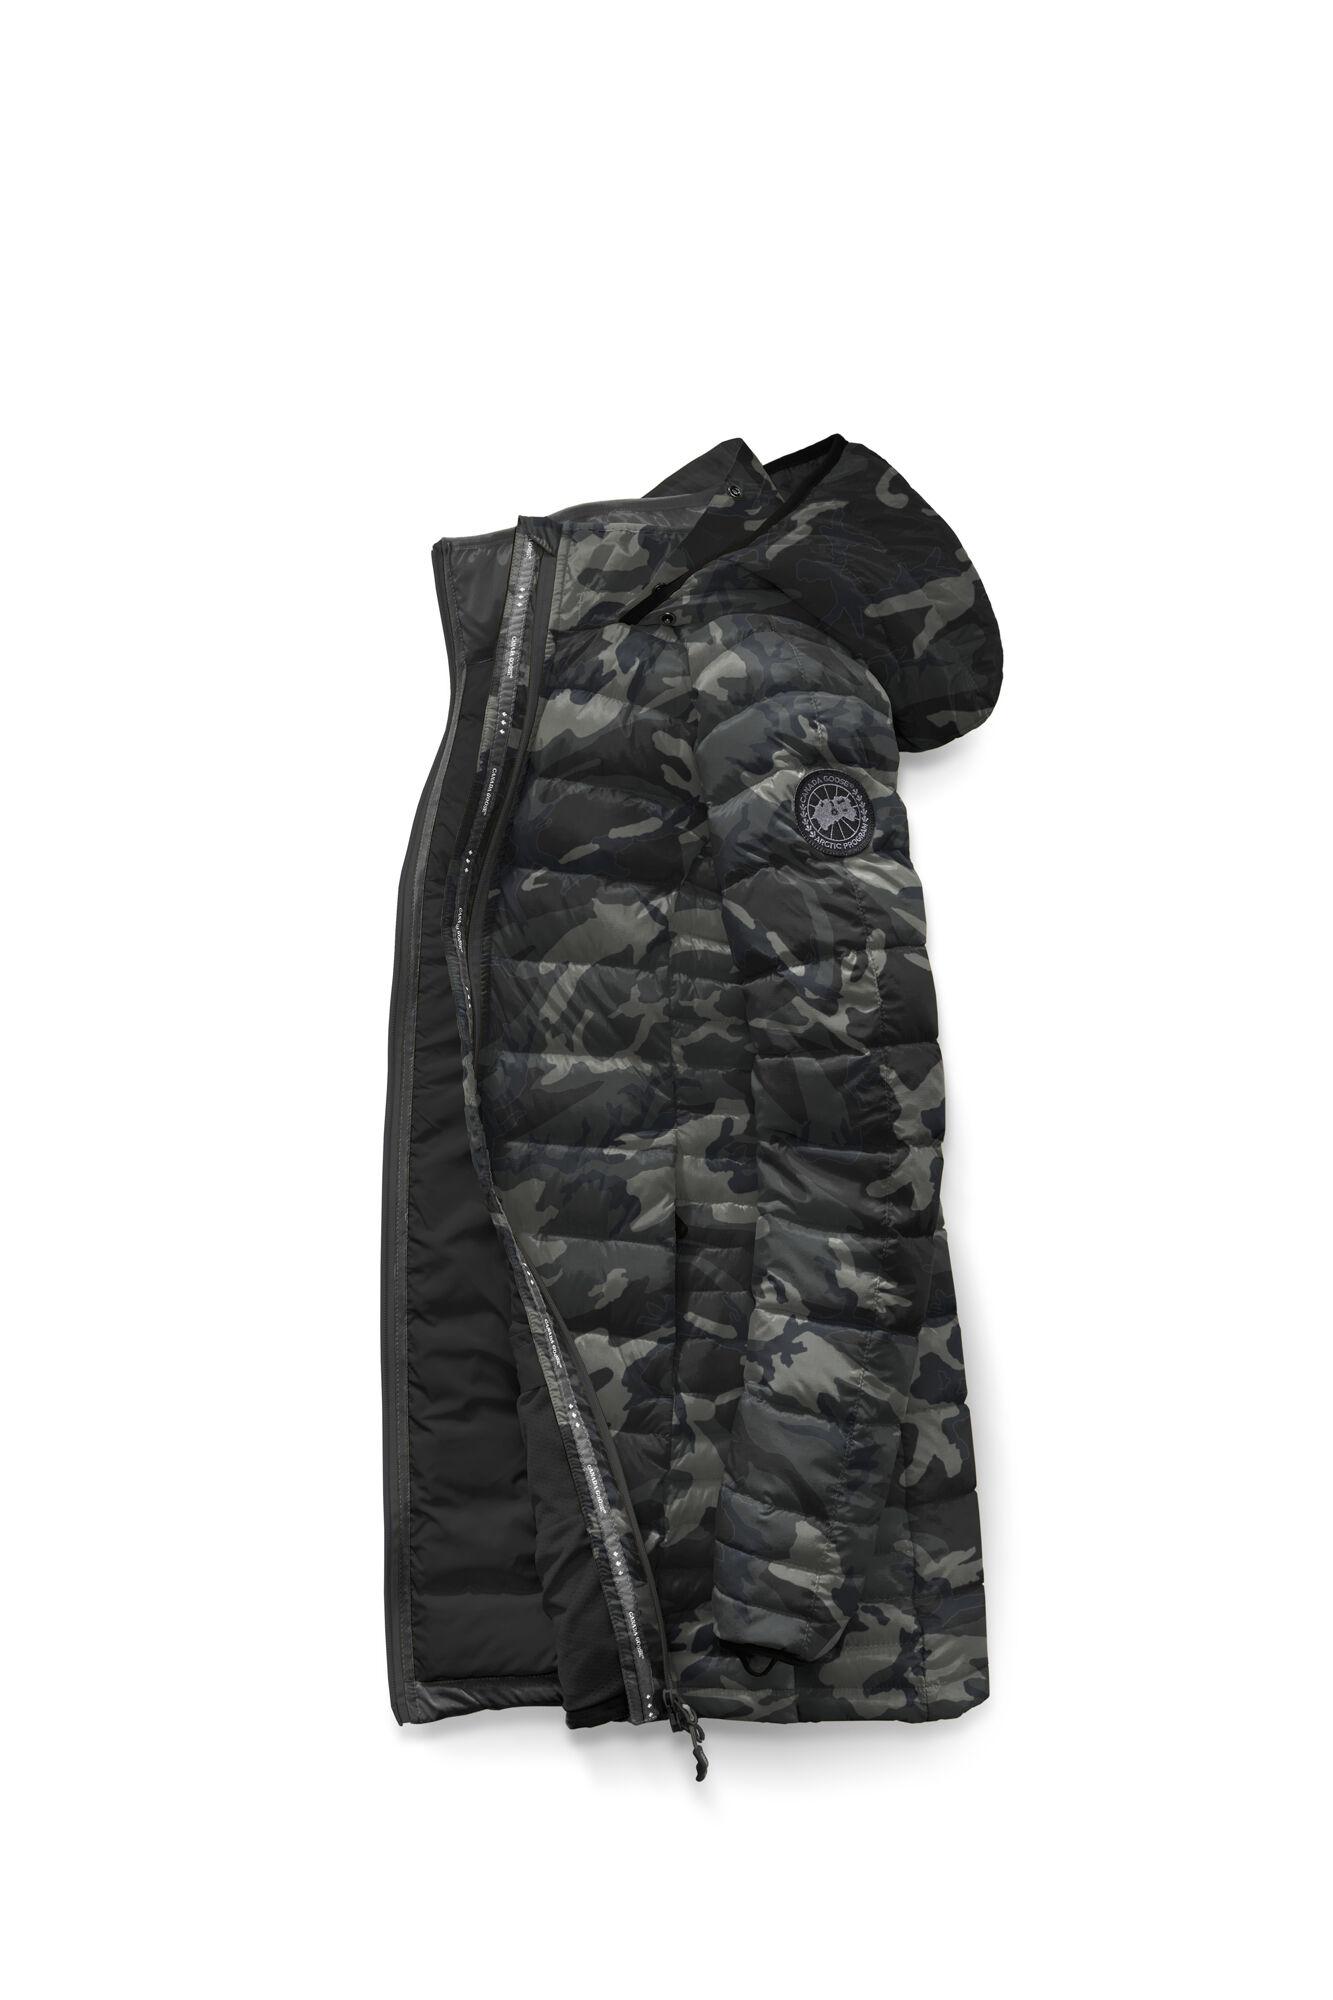 Brookvale Hooded Coat Black Label | Canada Goose®